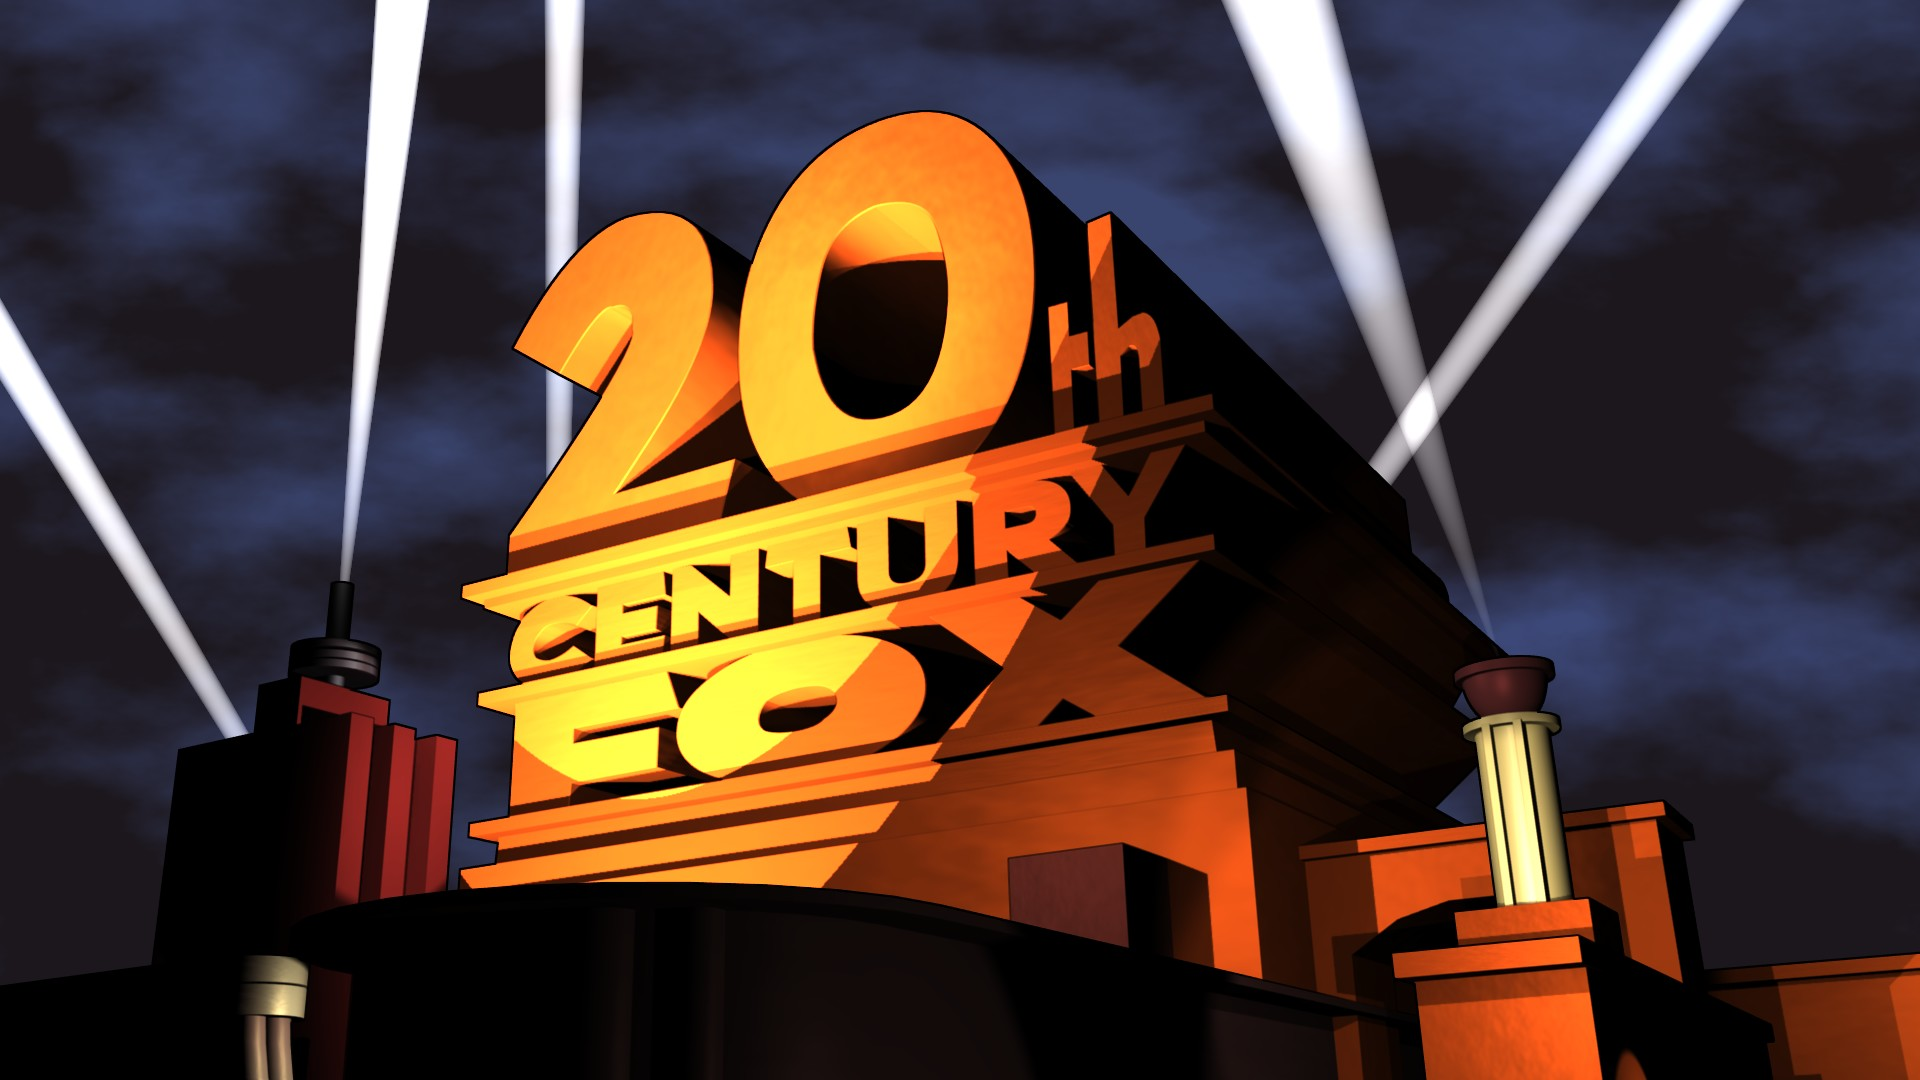 My own version of the 20th Century Fox logo 2 IMG by 20thCenturyDogs 1920x1080